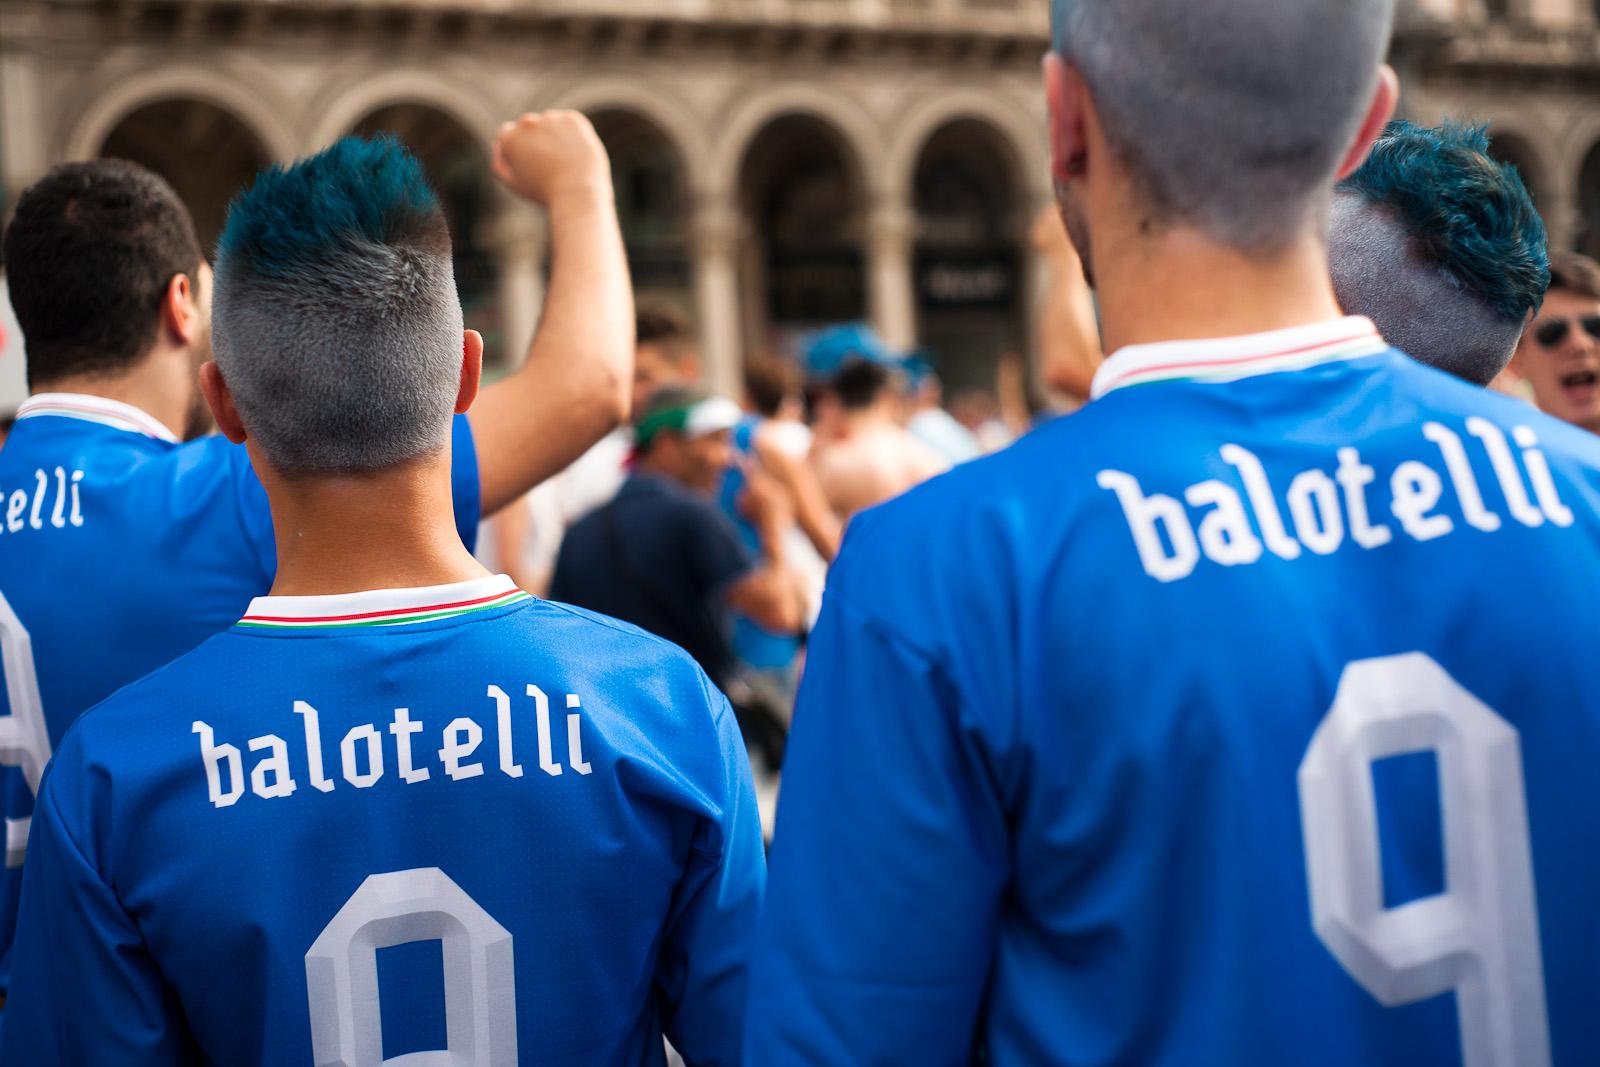 Balotelli's Fans